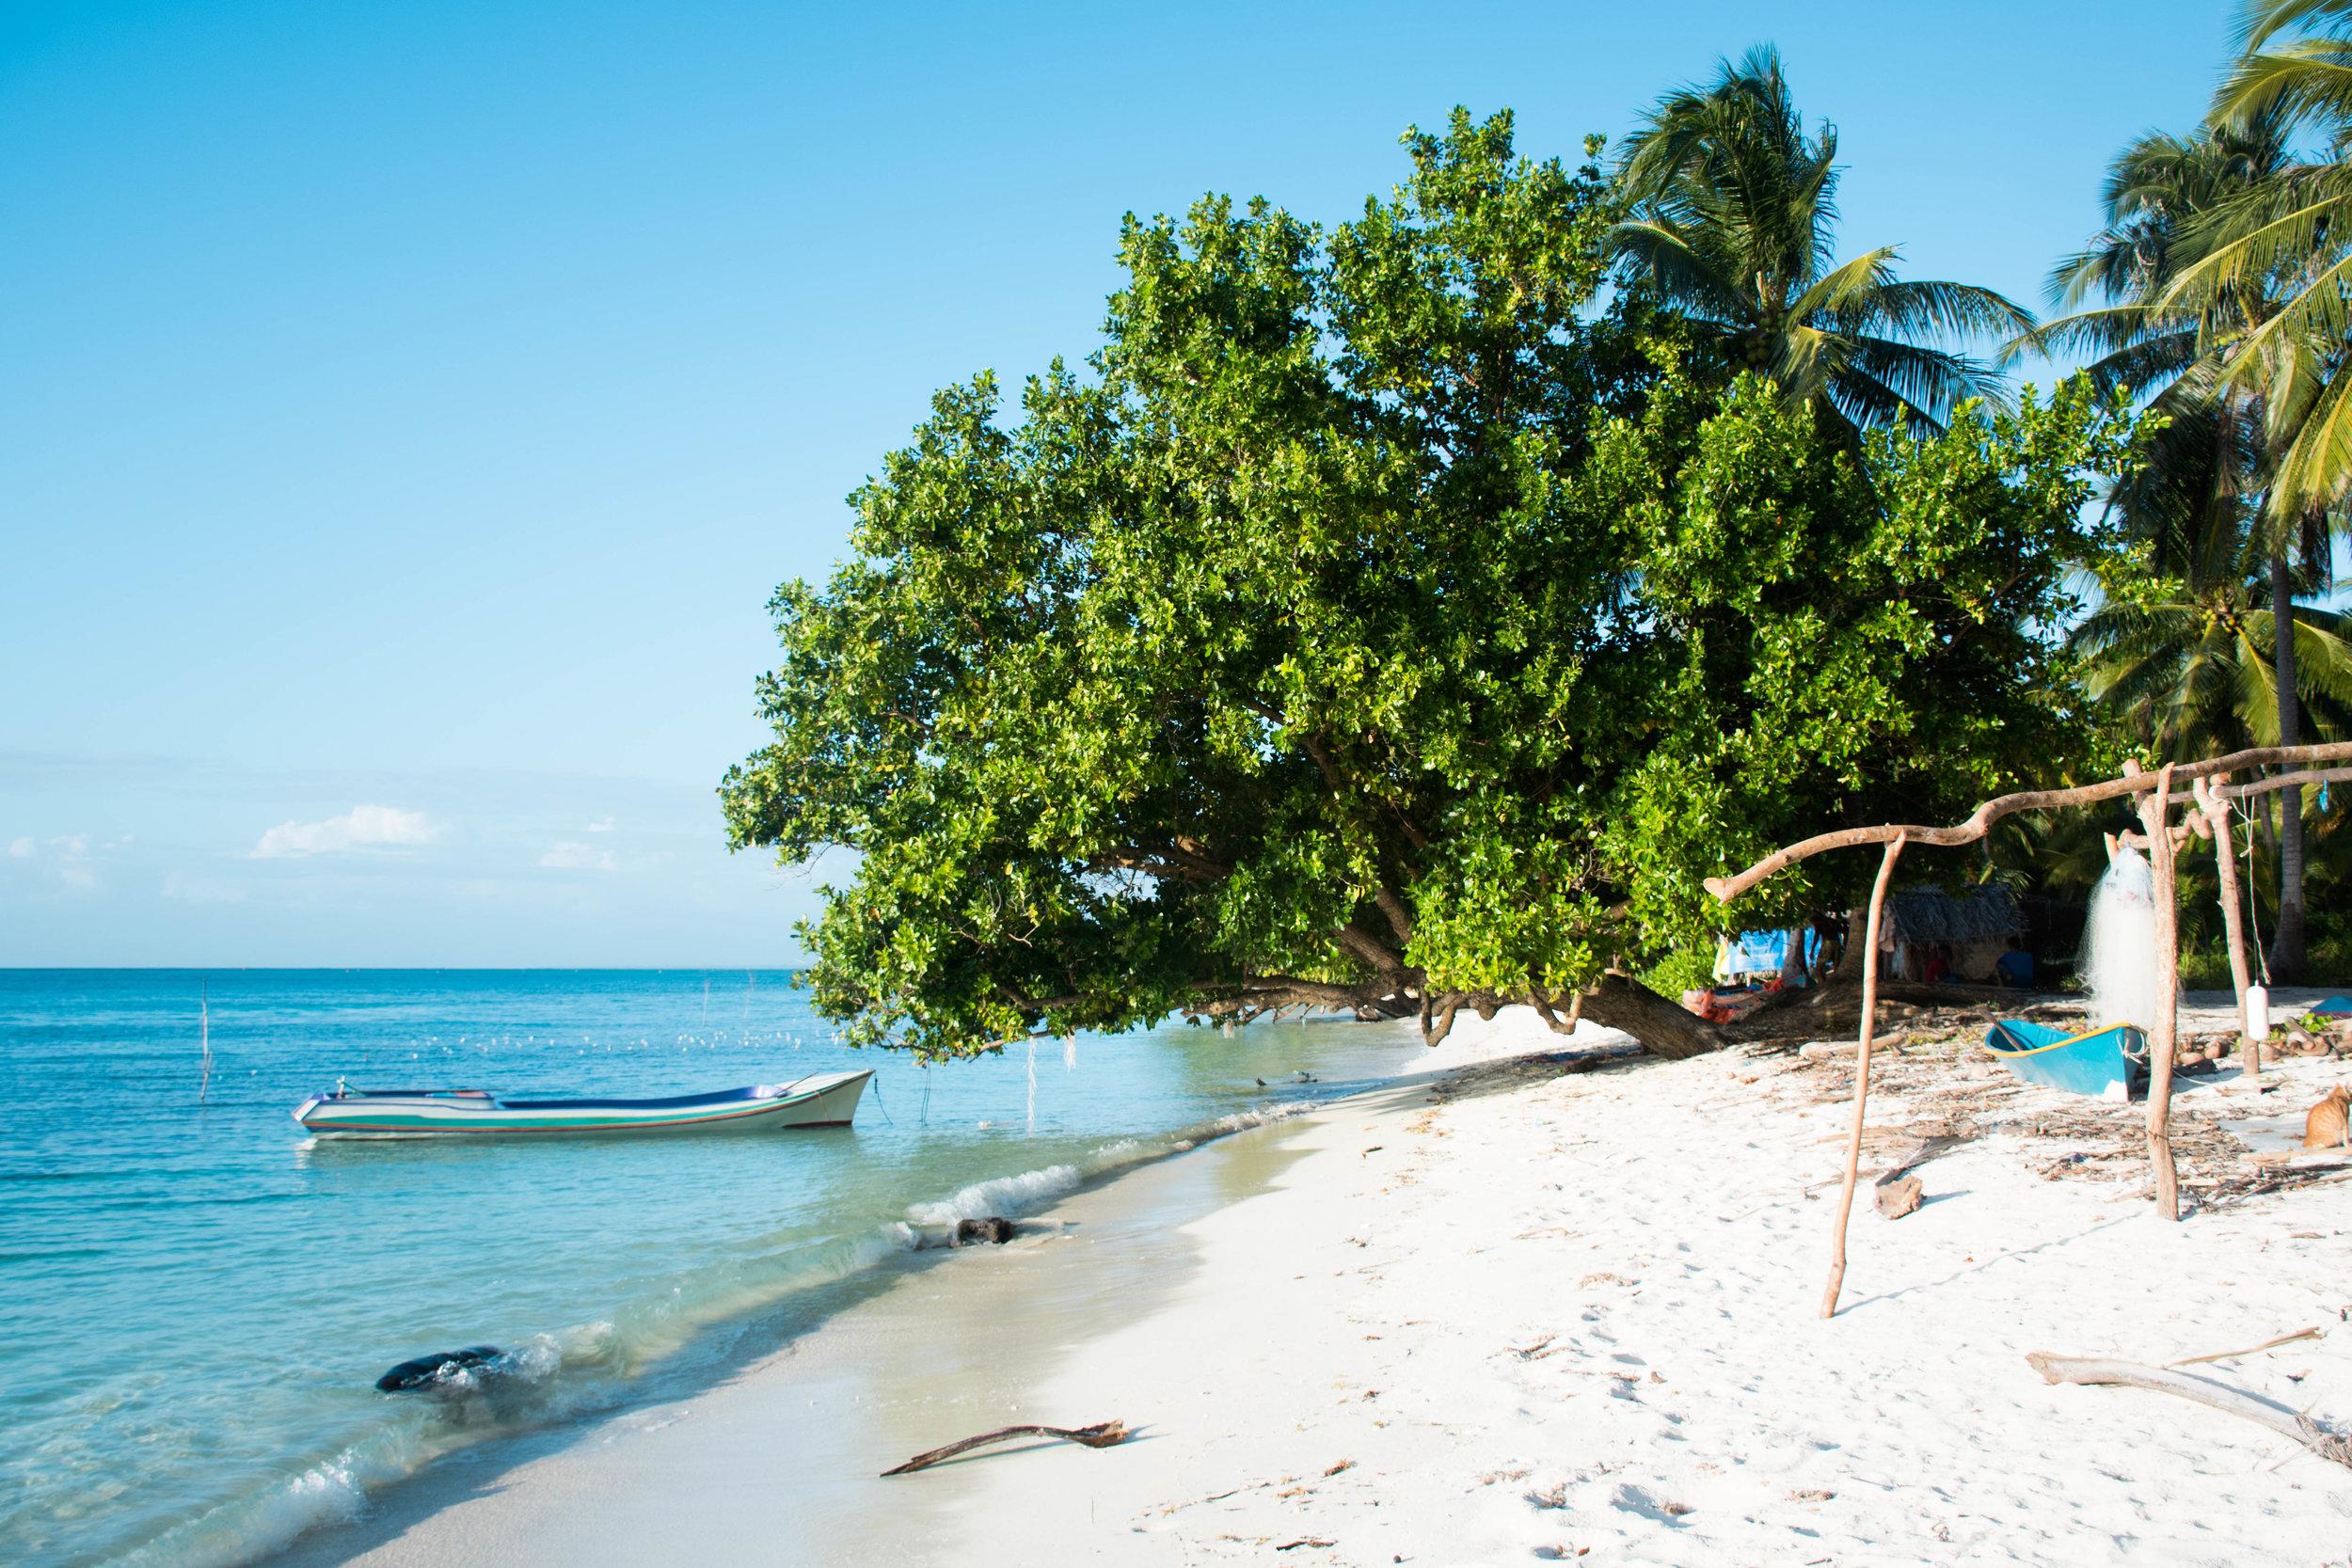 Canderaman Island